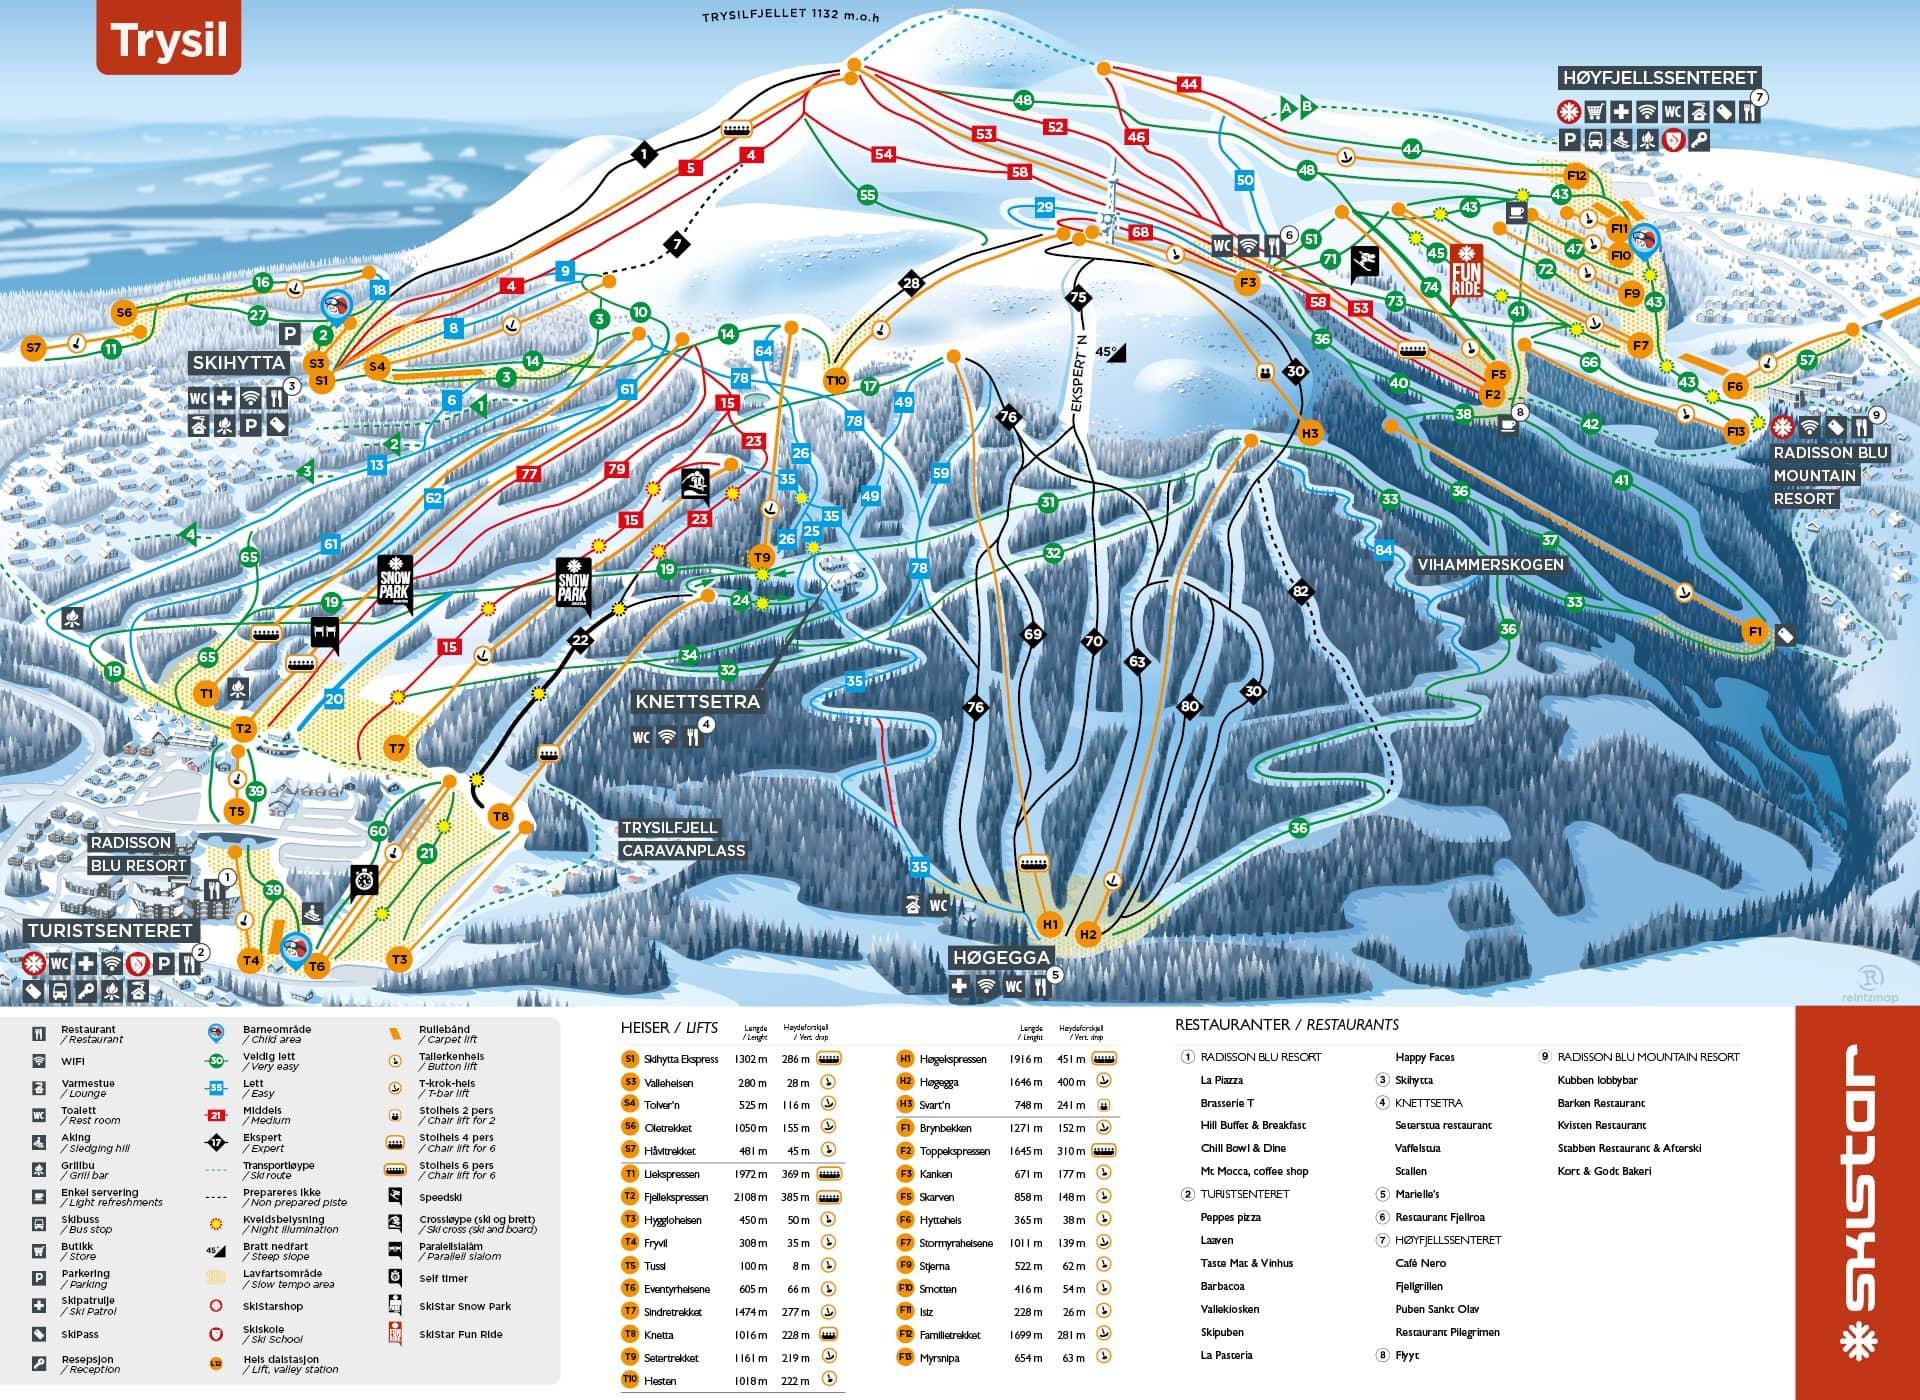 Trysil - mäekaart